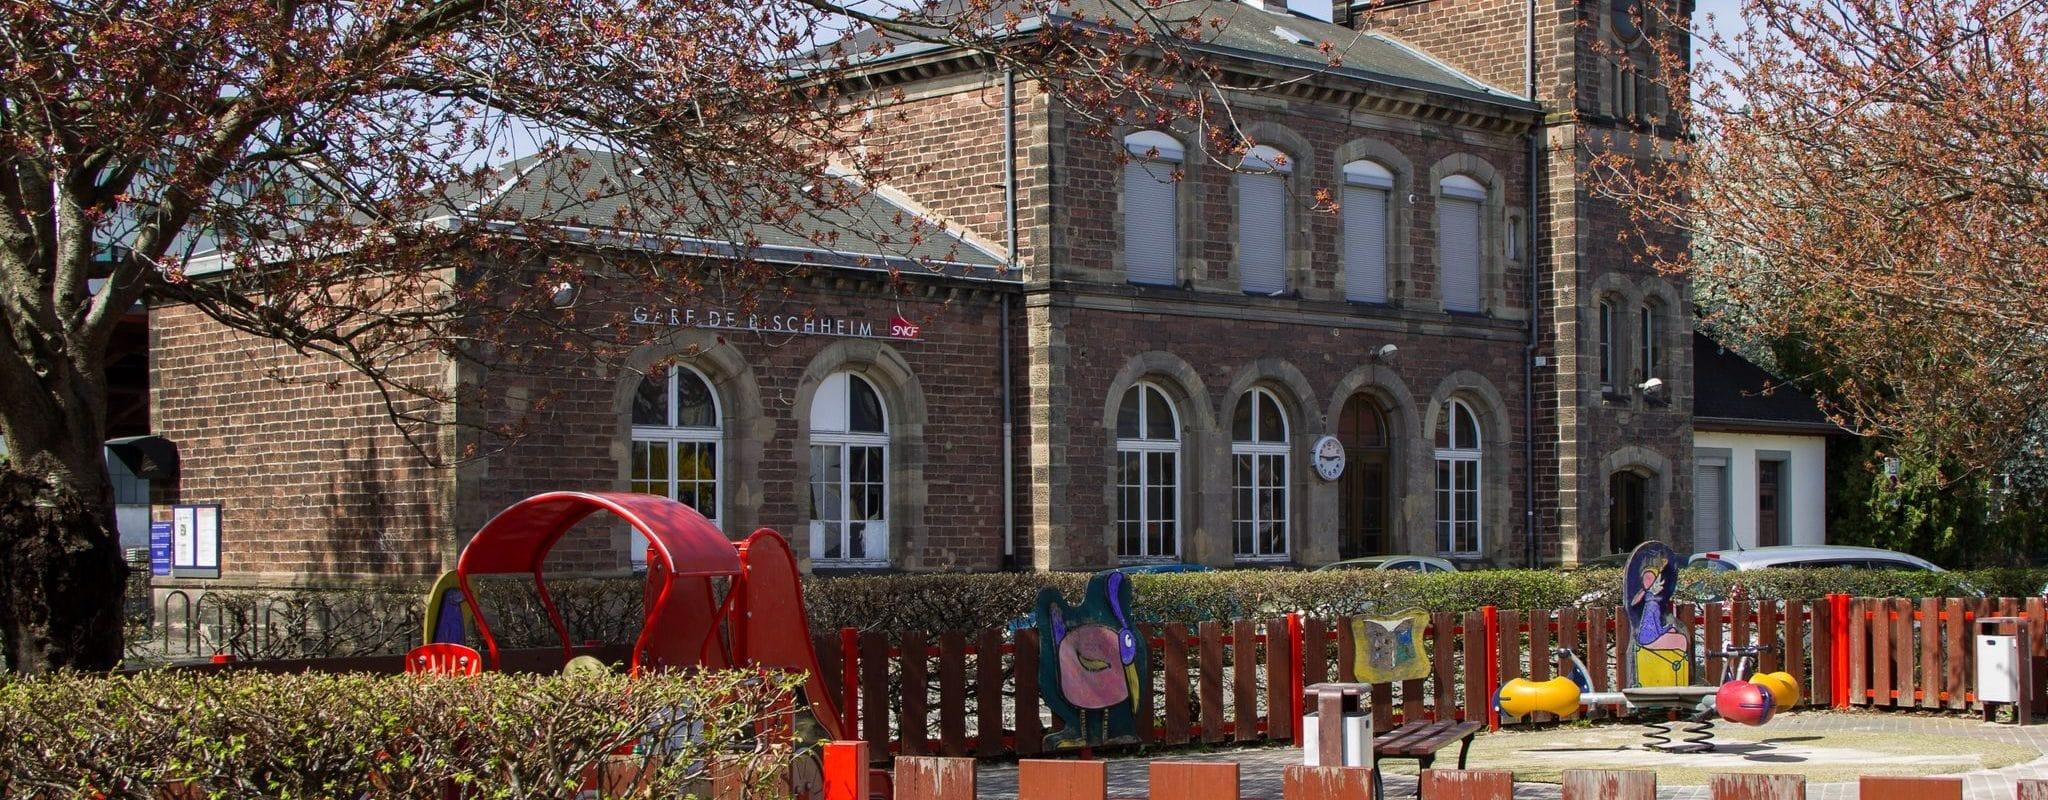 Mobilisation pour sauver la gare de Schiltigheim